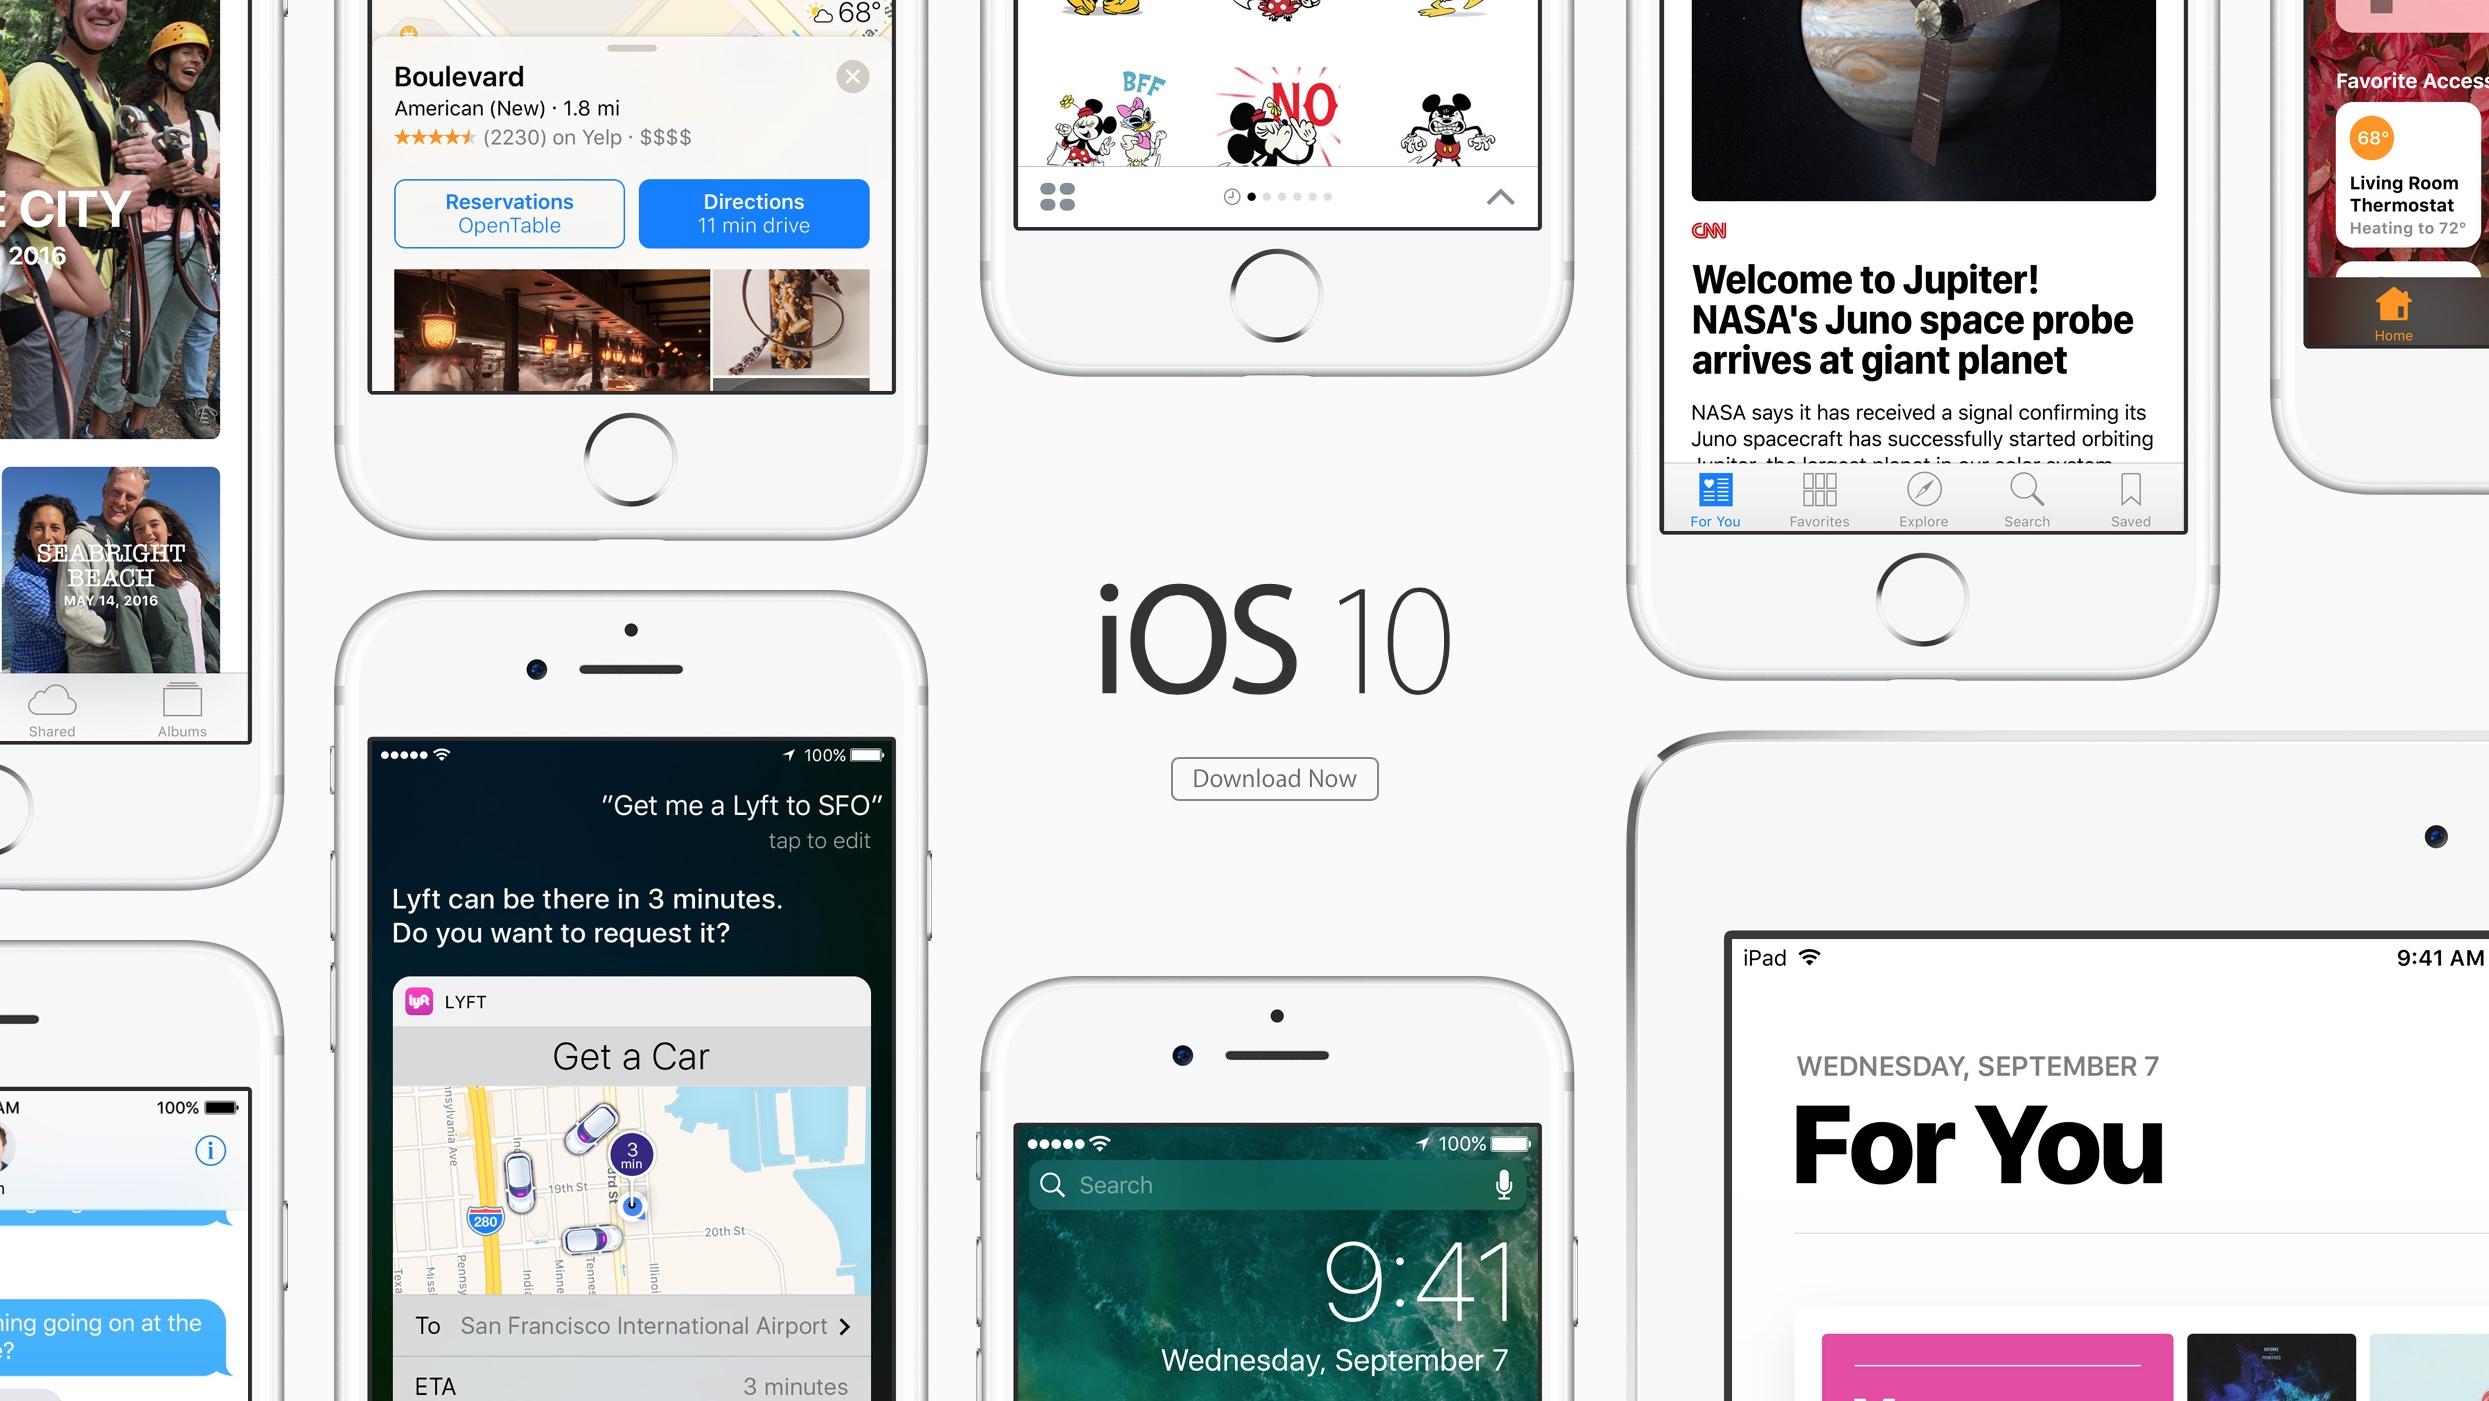 Como descargar app de iphone gratis ios 10